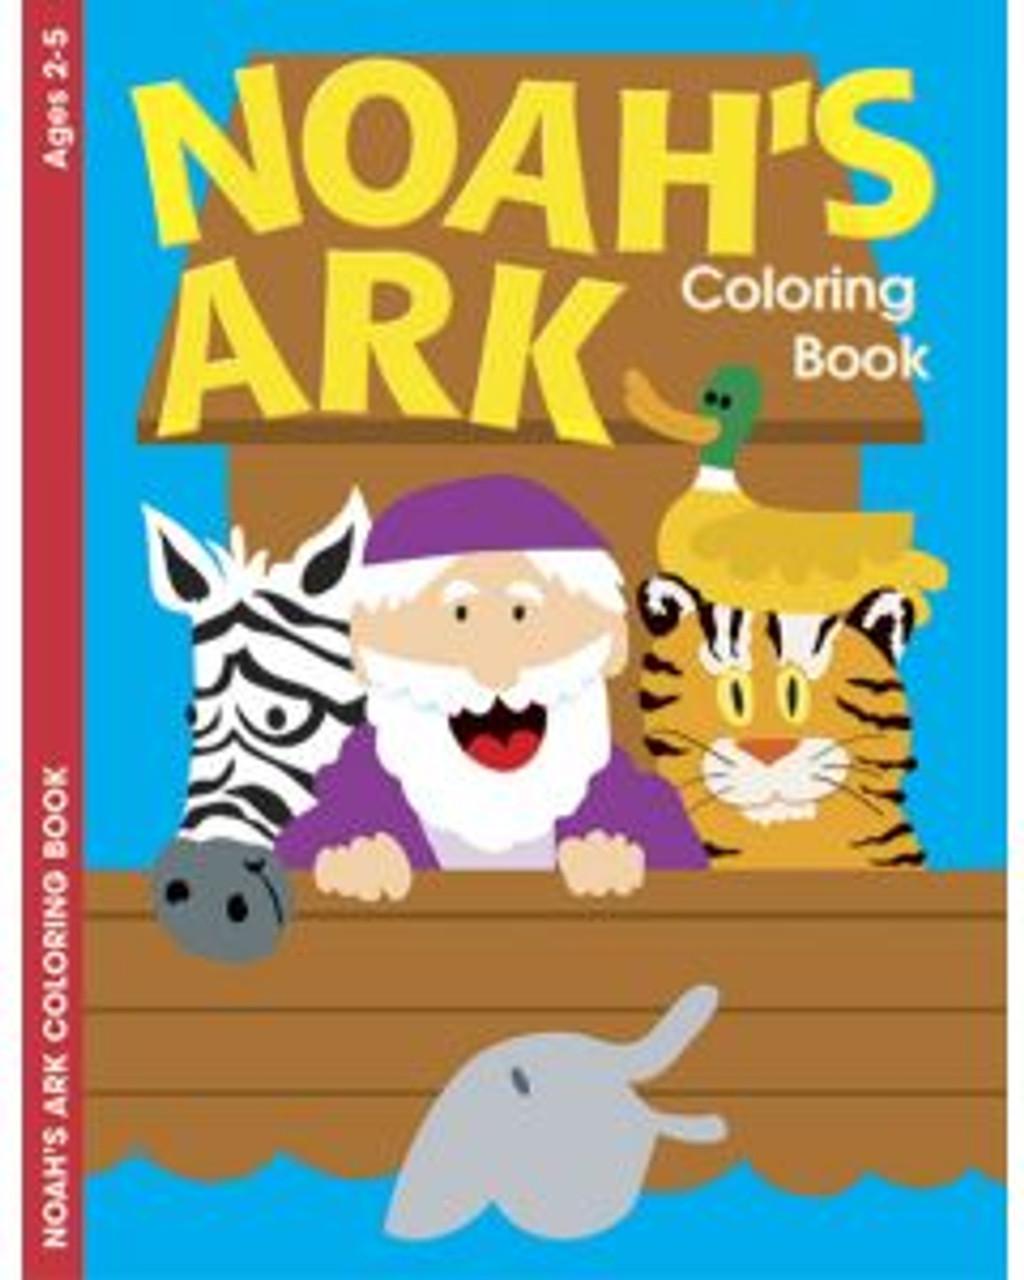 Noah's Ark (coloring book)